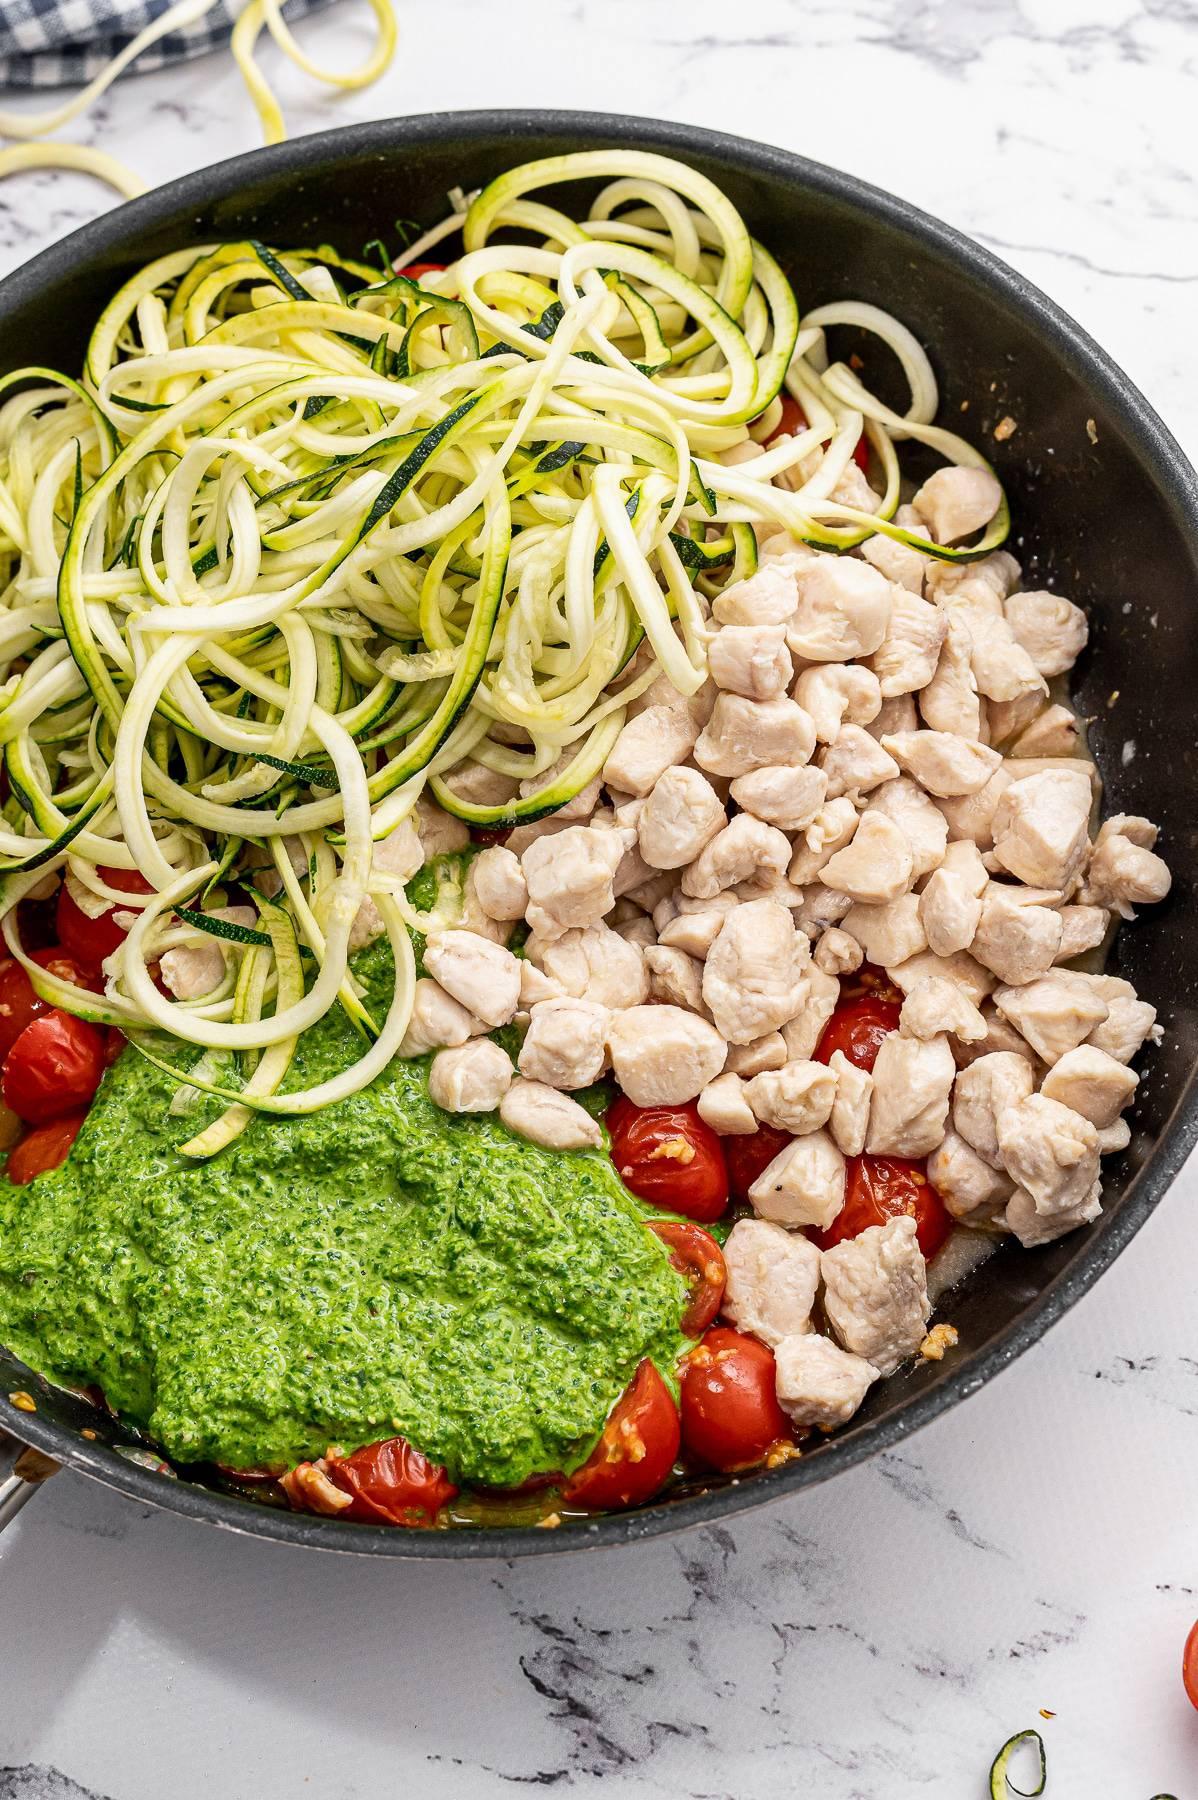 pesto noodle ingredients in a pan.